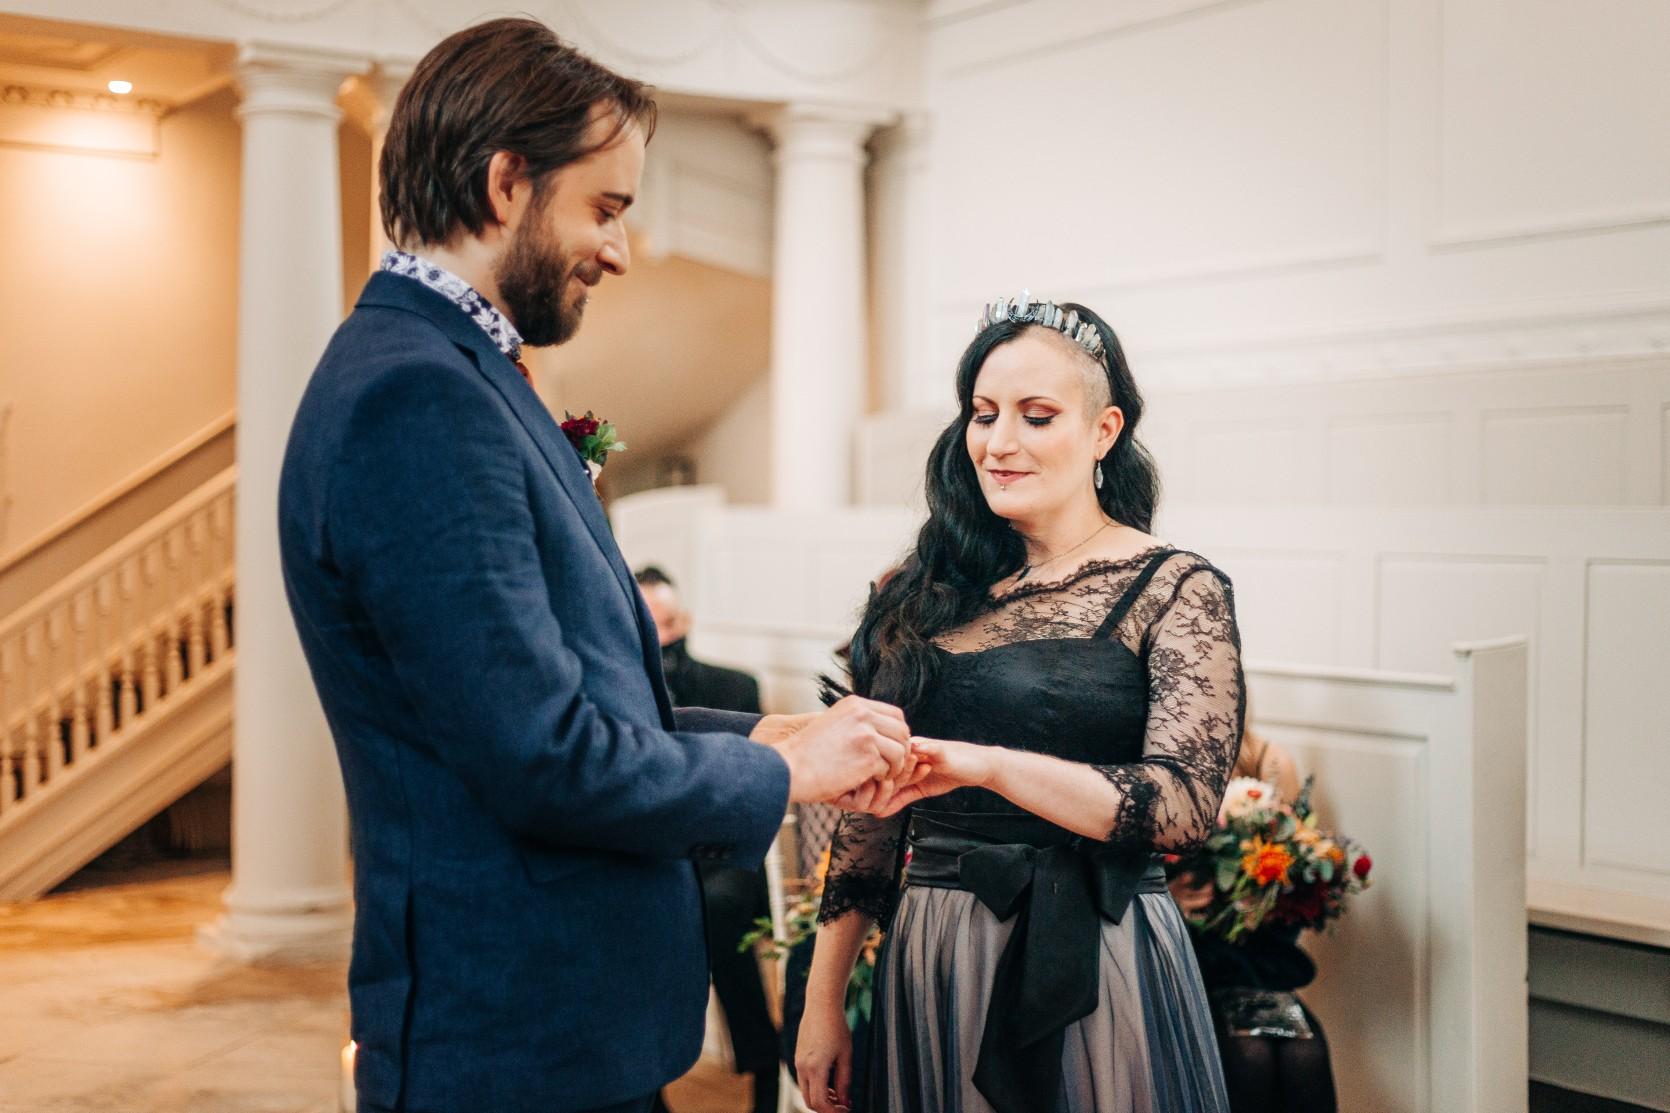 intimate alternative wedding - alternative micro wedding - small wedding ceremony